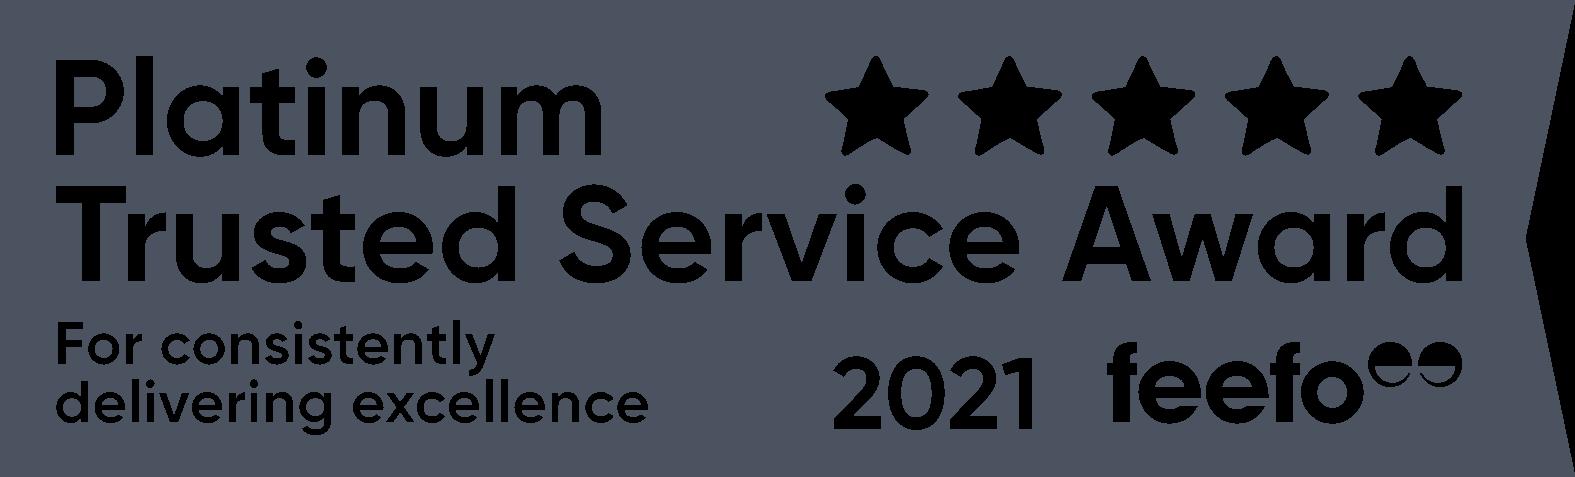 Feefo platinum award 2020